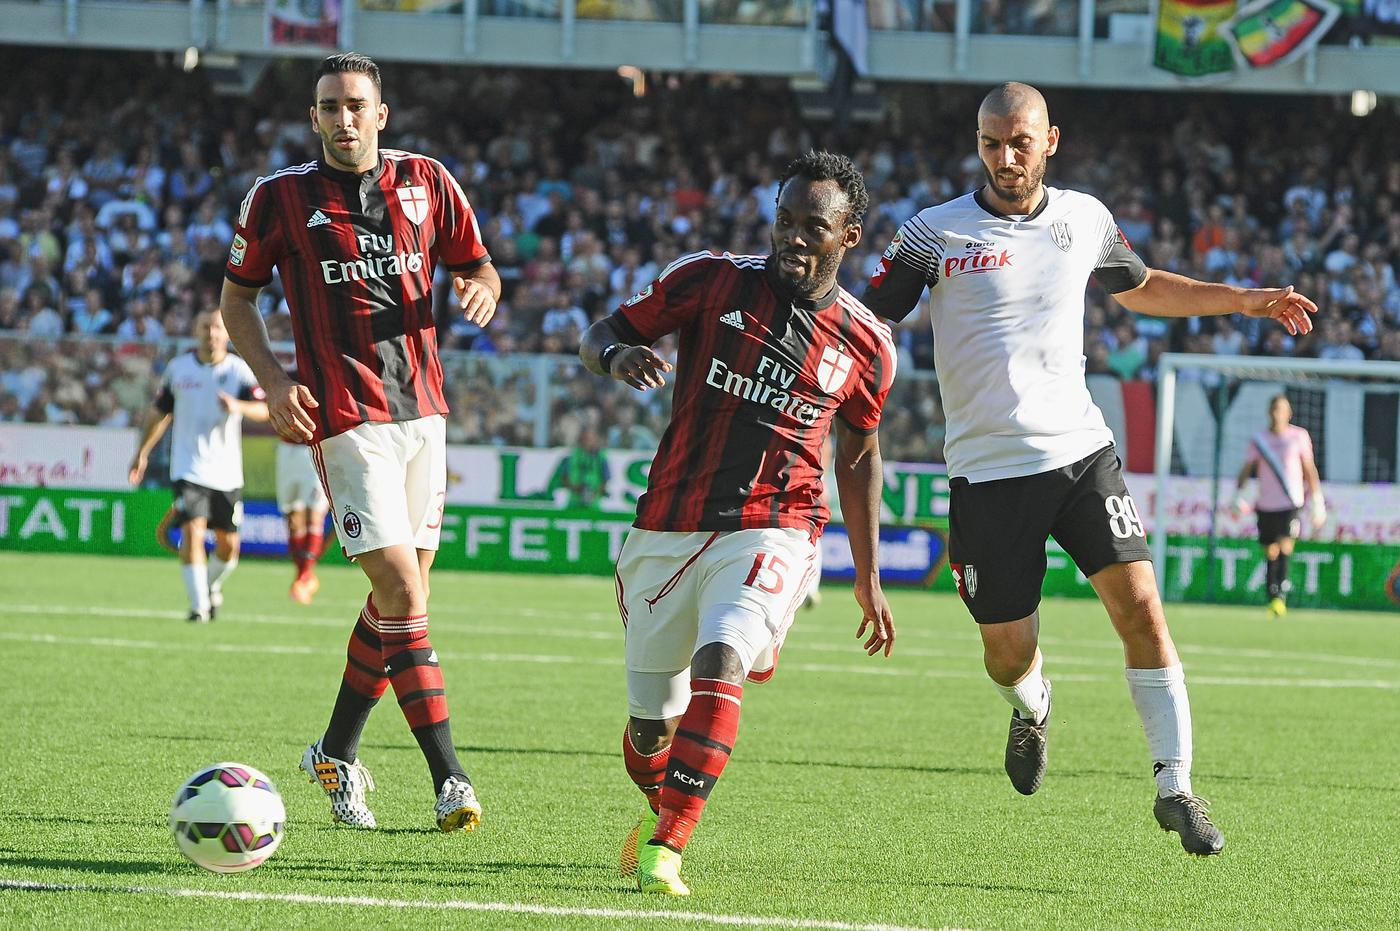 Michael Essien Ebola reports are fake, claim AC Milan